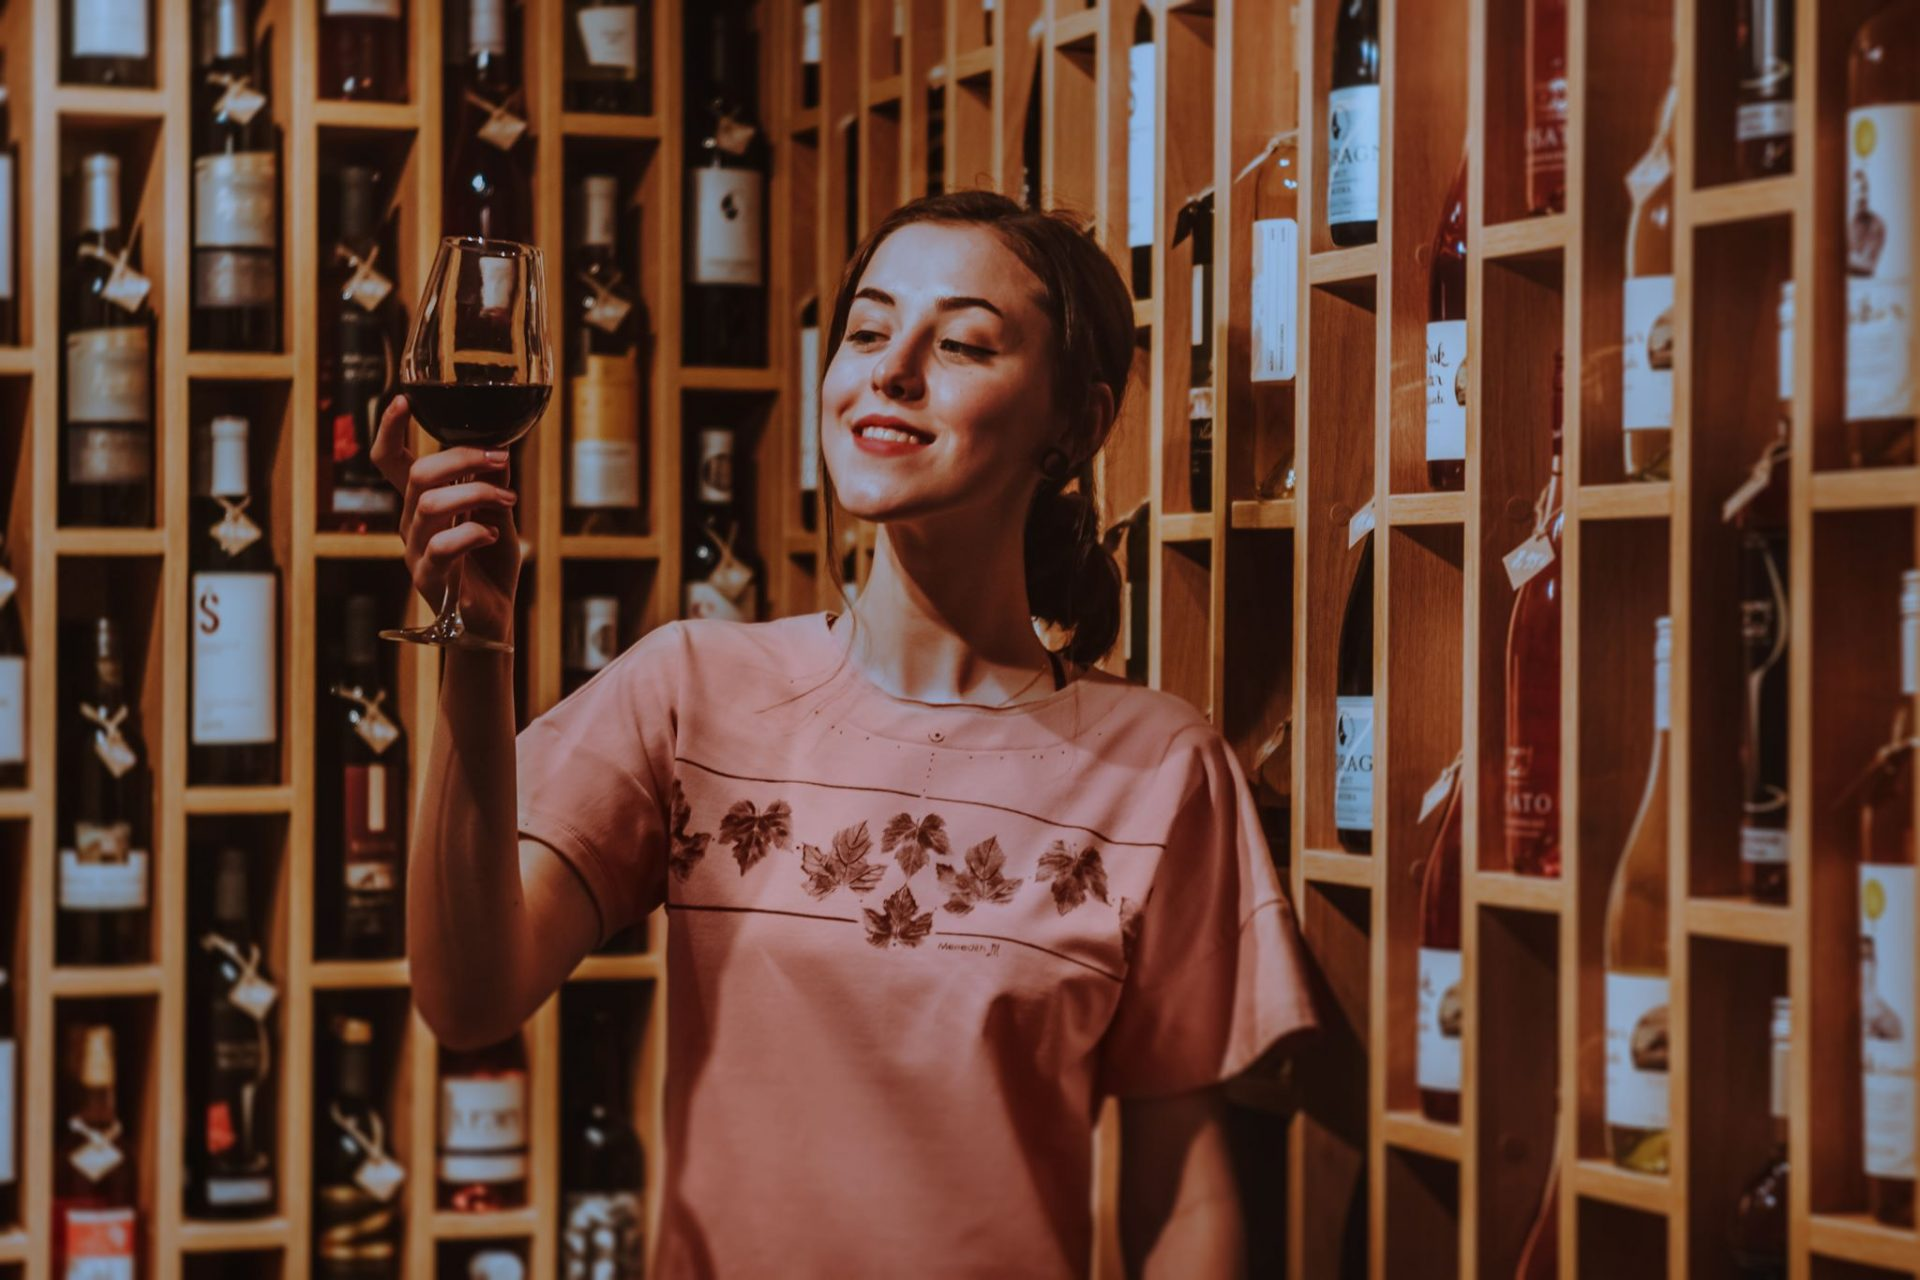 Ružové dámske tričko In Vino